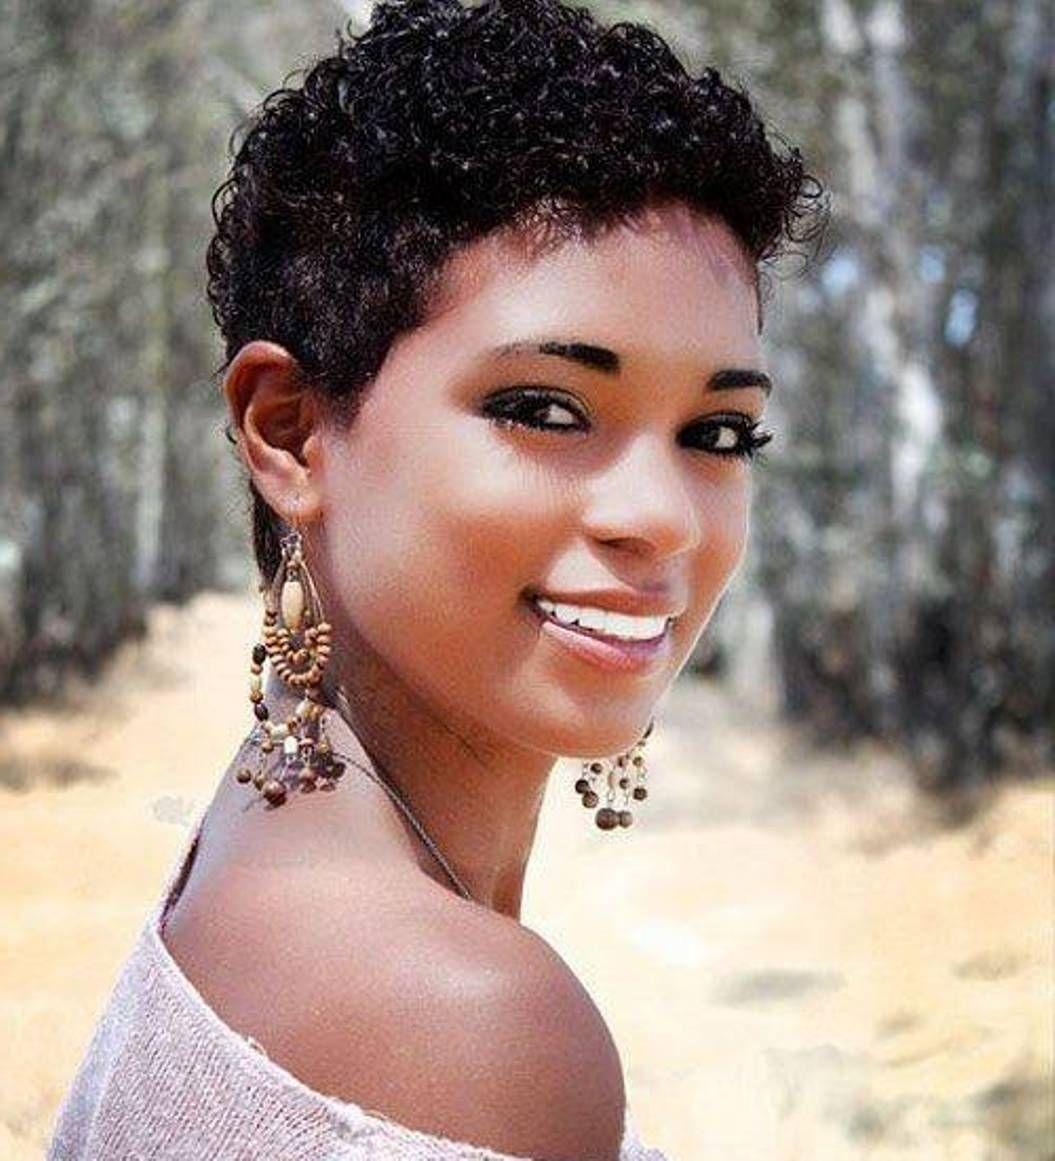 Shortnaturalhairstyles hairstylesforgirls haircare